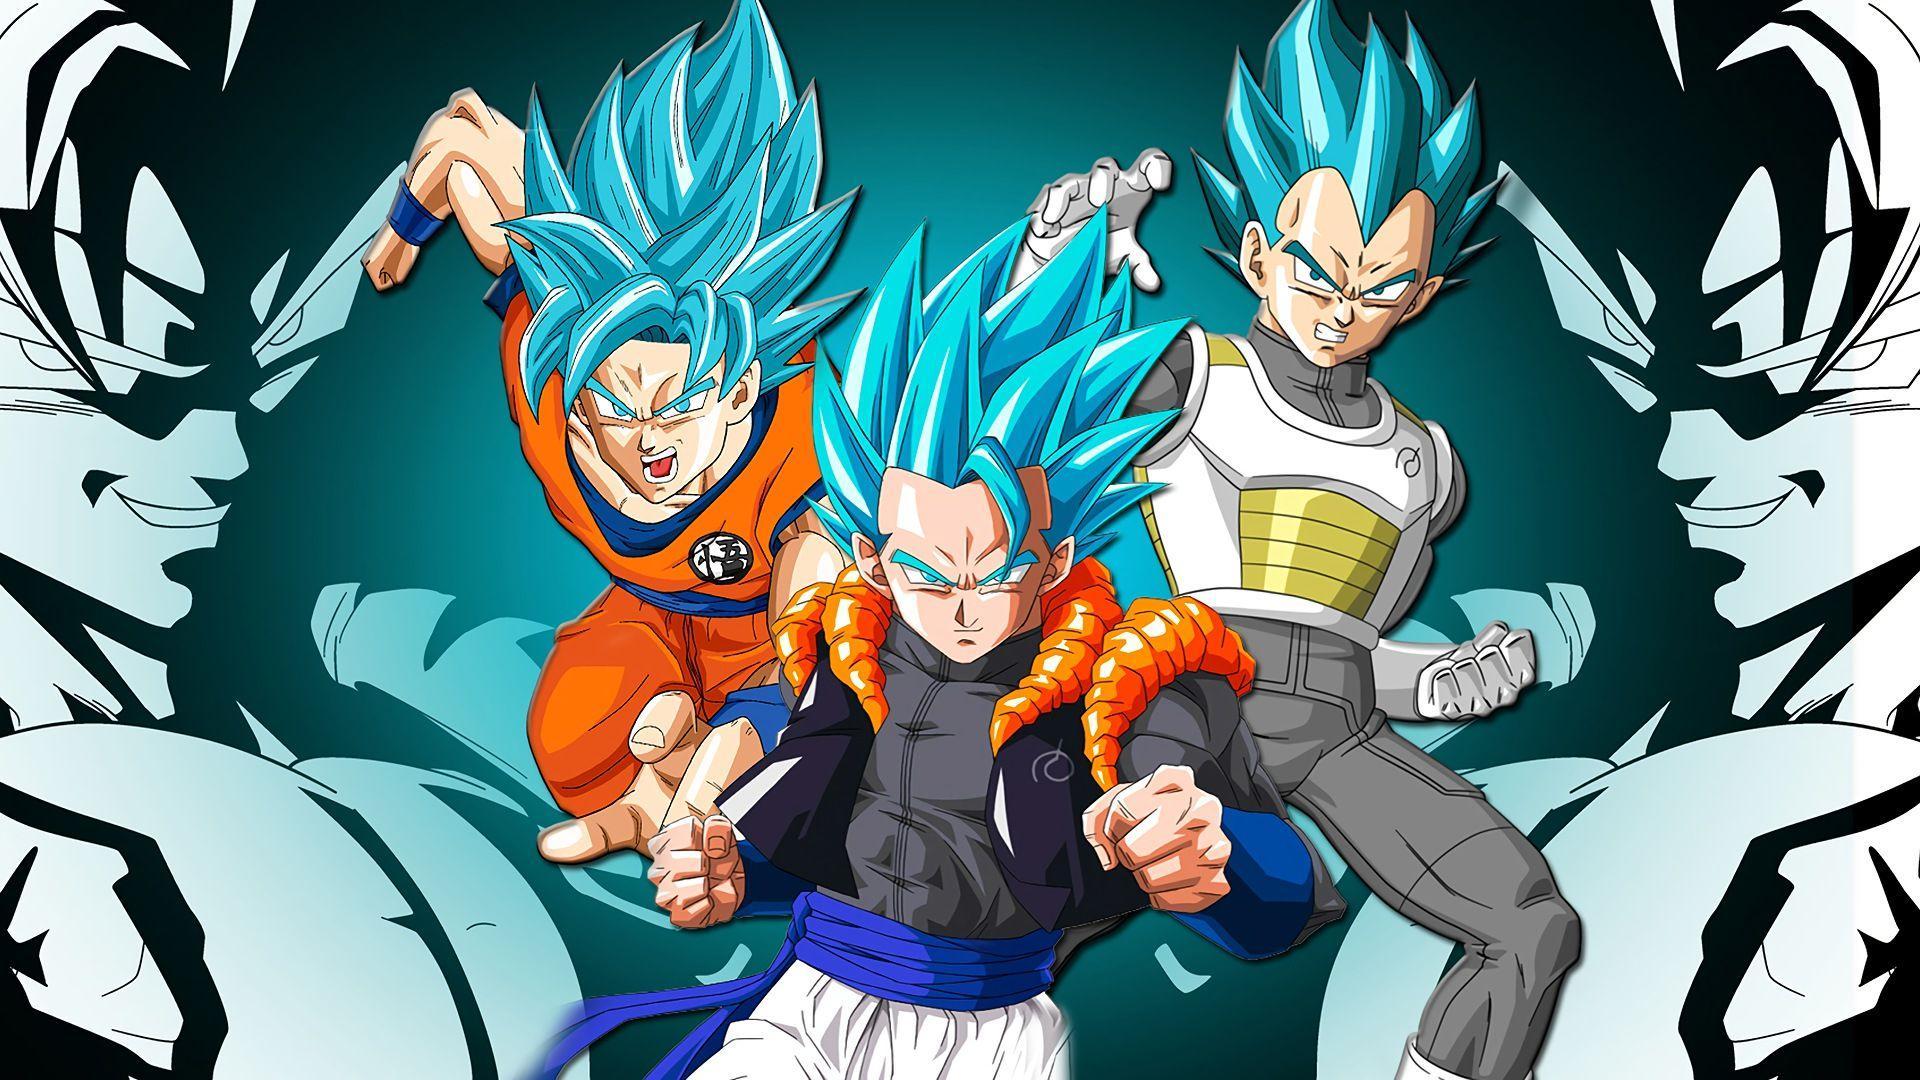 Goku And Vegeta Wallpapers Top Free Goku And Vegeta